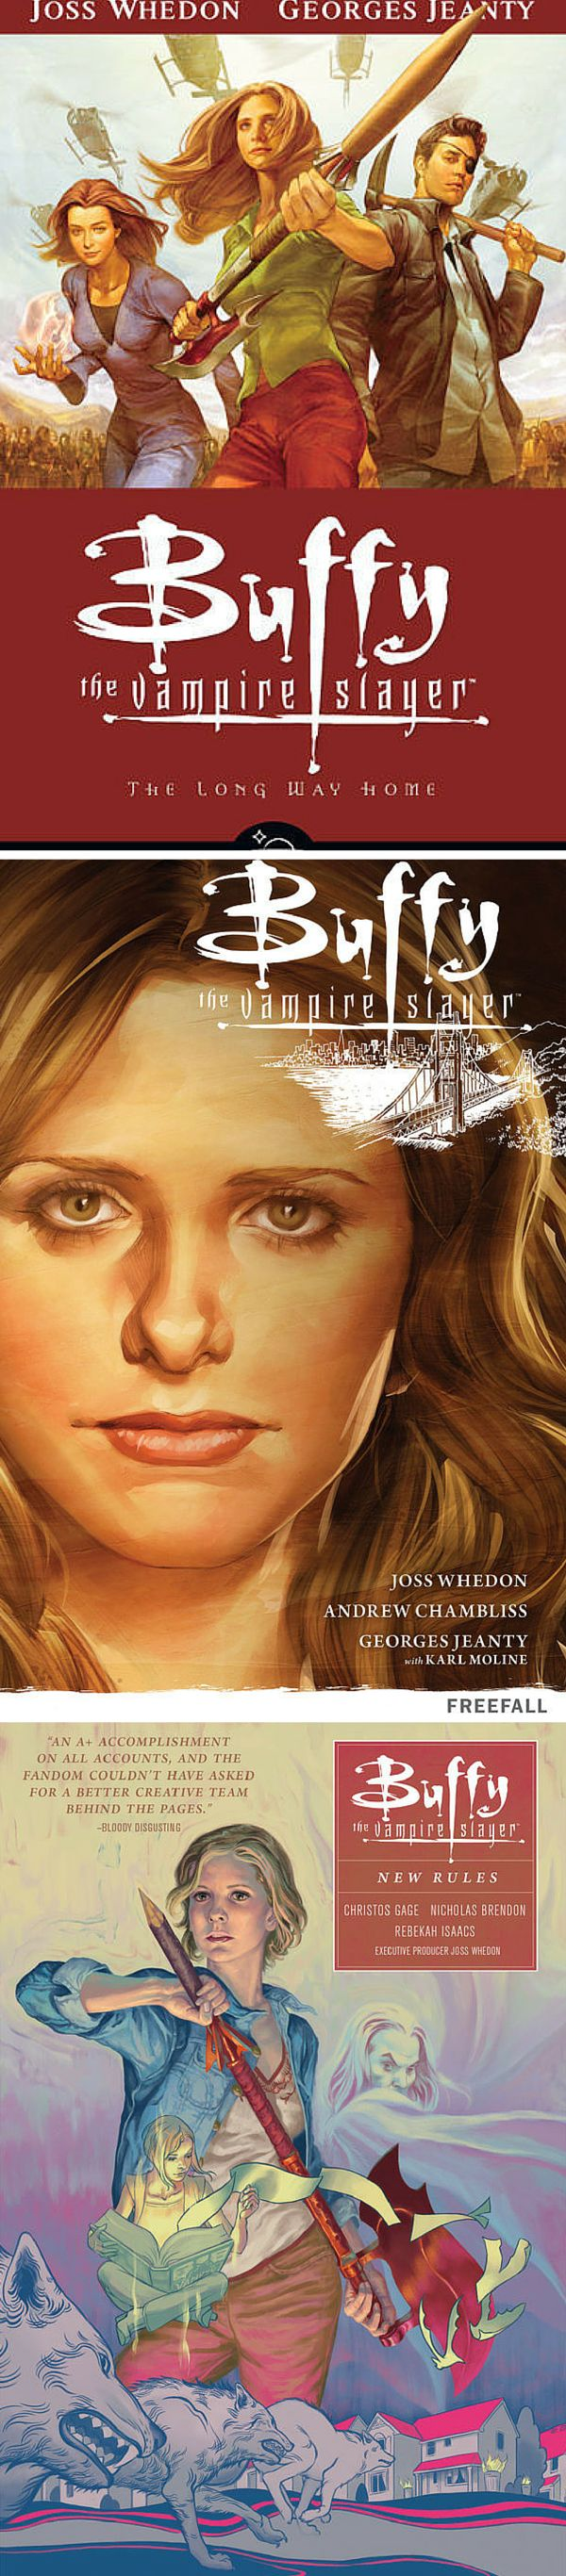 Buffy the Vampire Slayer Season 8, 9  & 10. Continue the story of the Slayer from Dark Horse comics